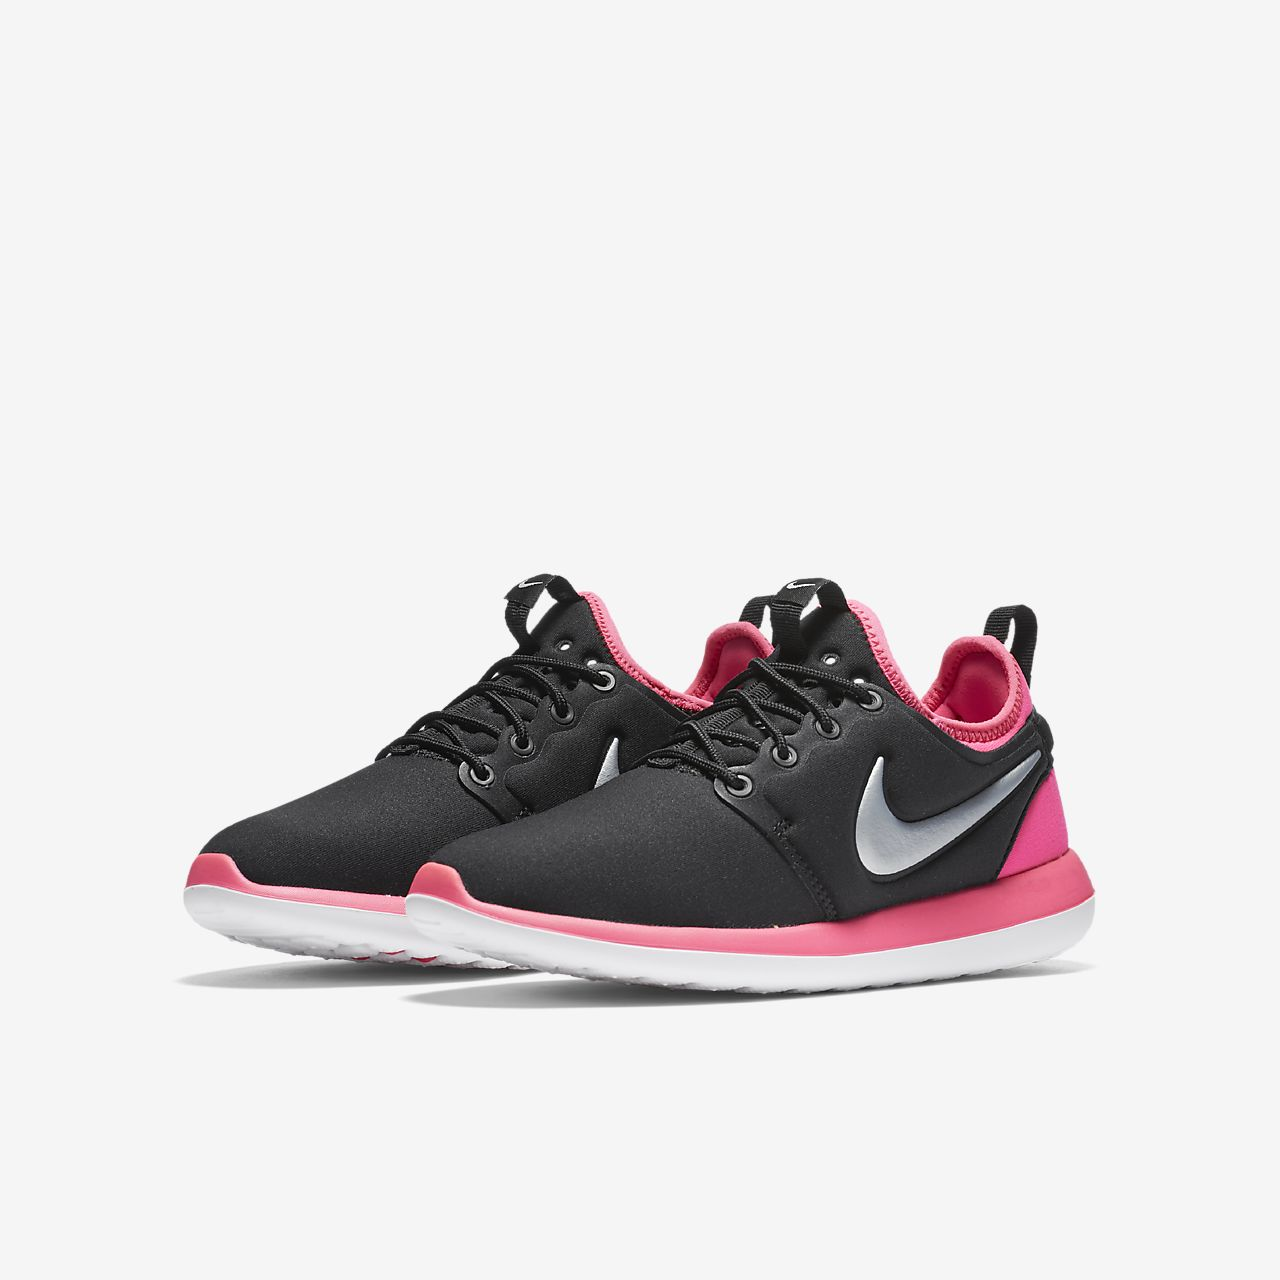 ... Calzado para niños talla grande Nike Roshe Two